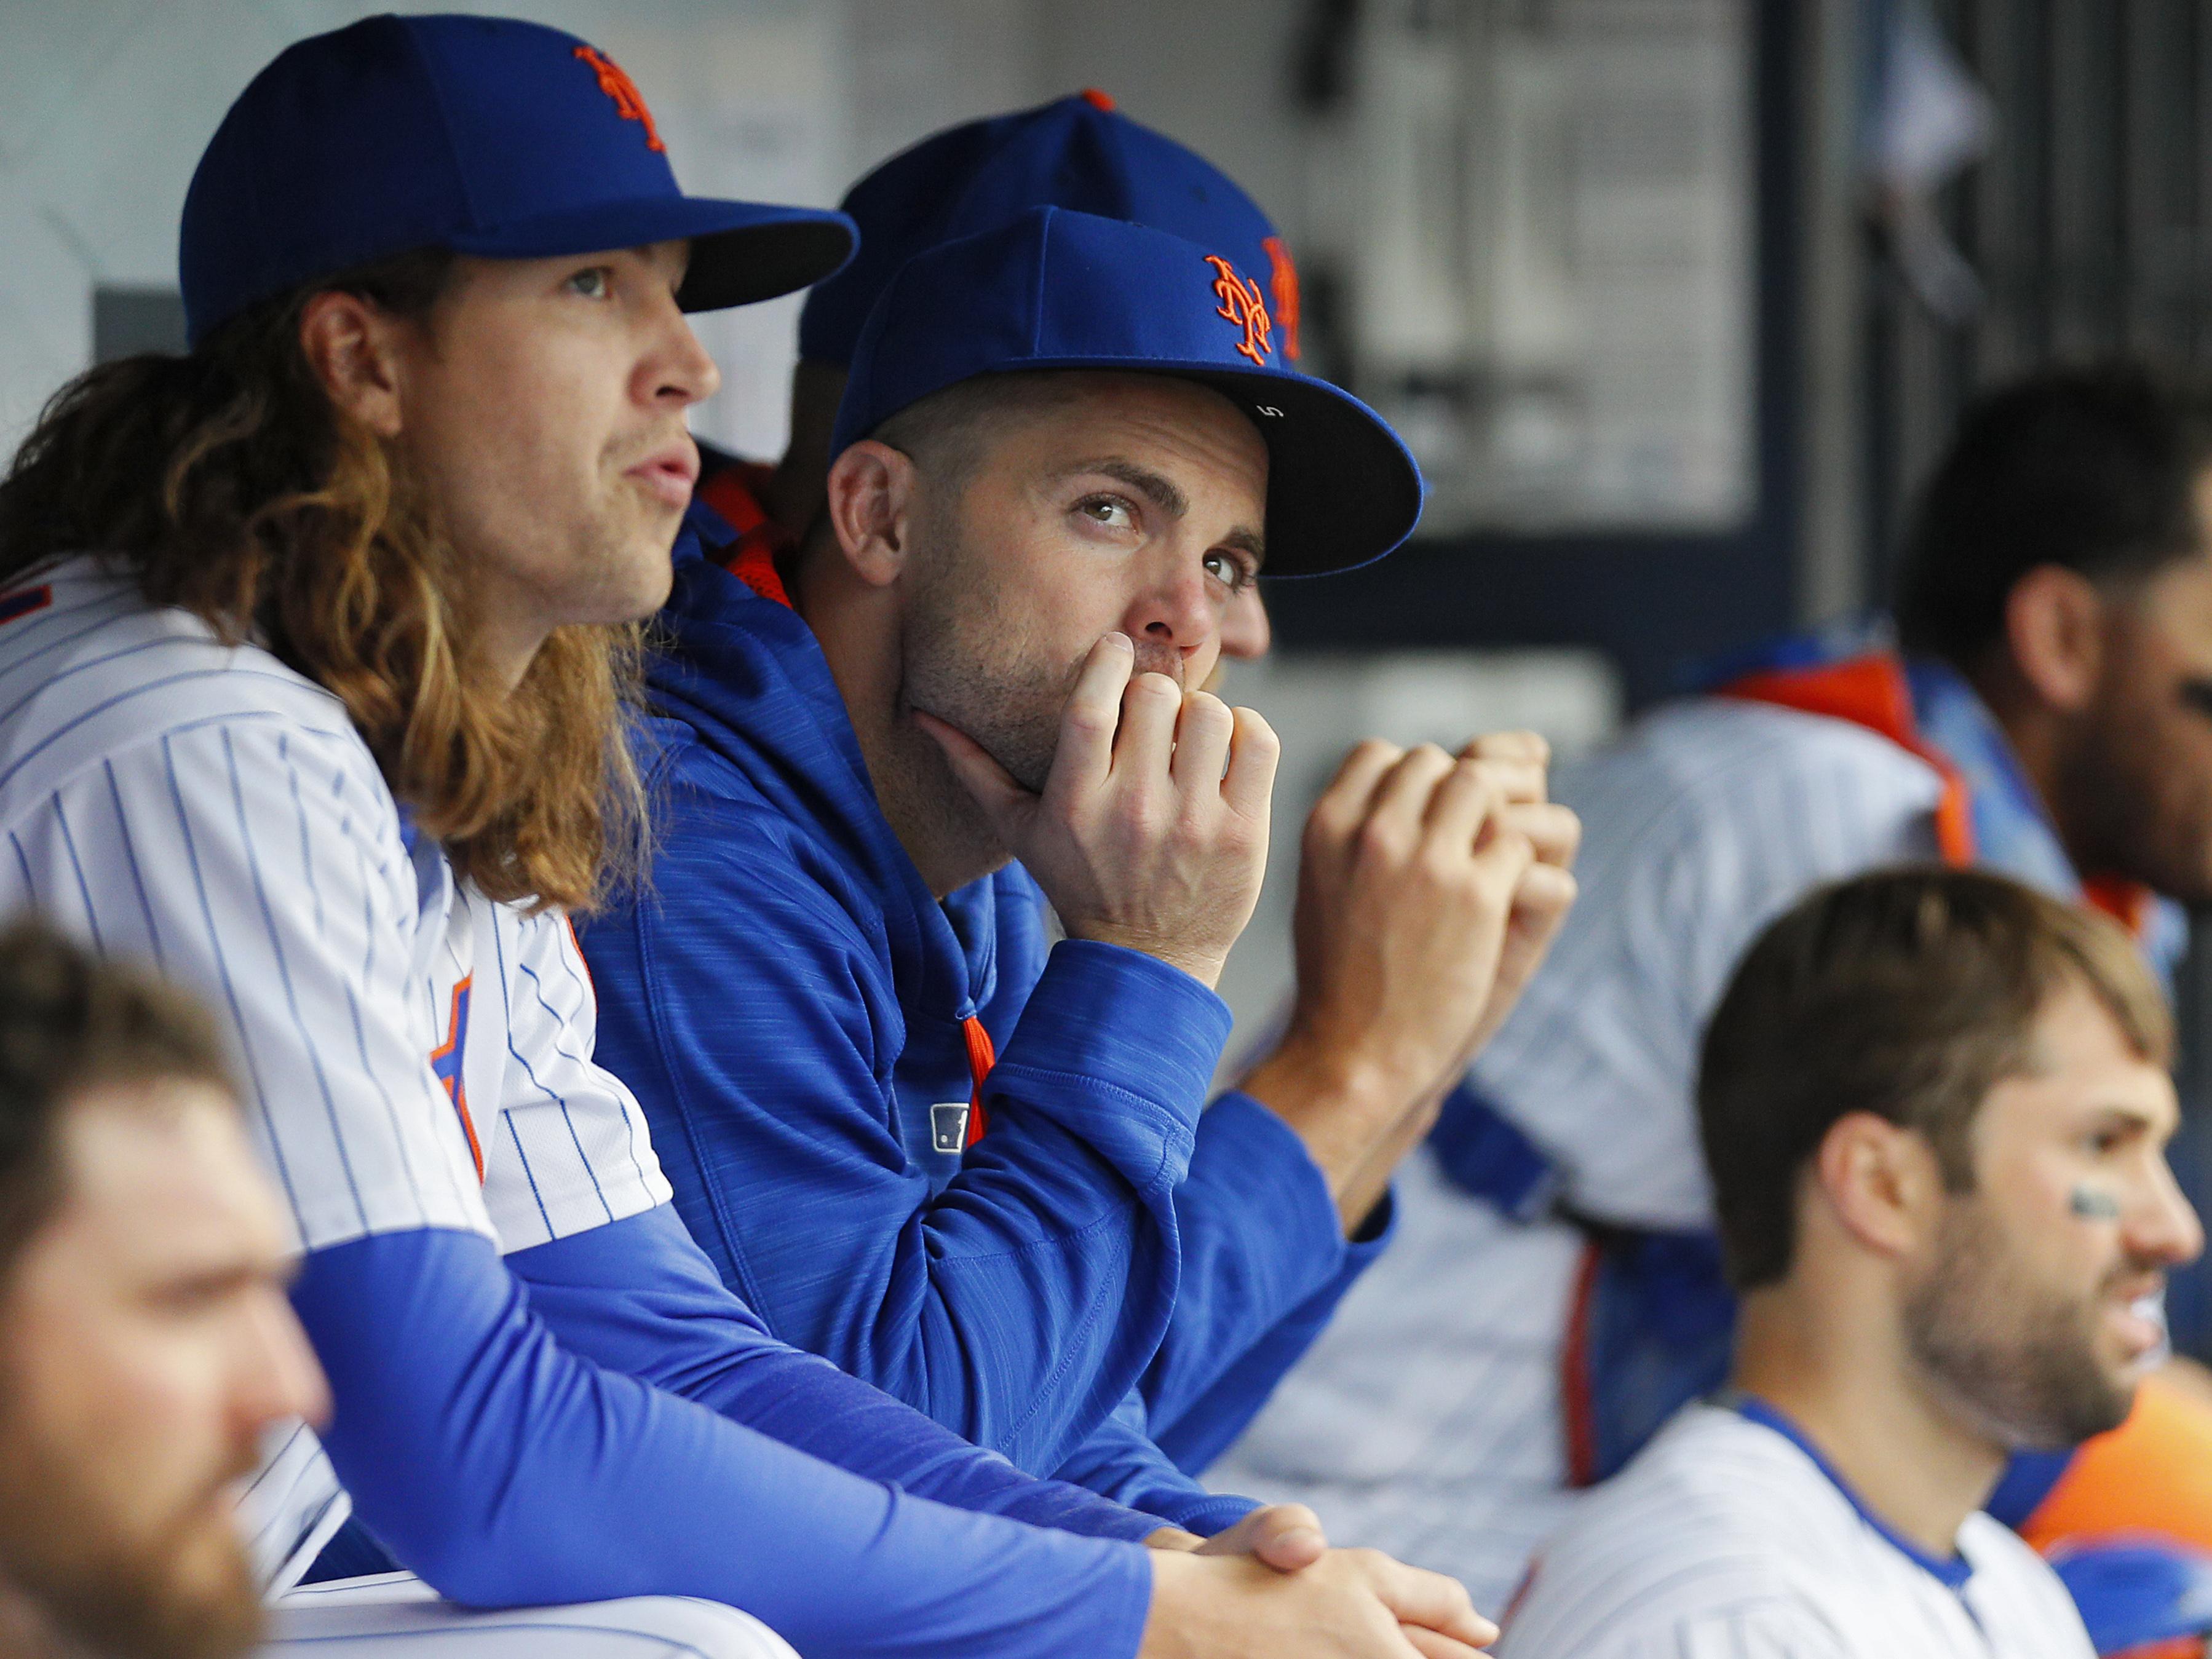 Miami Marlins vs New York Mets